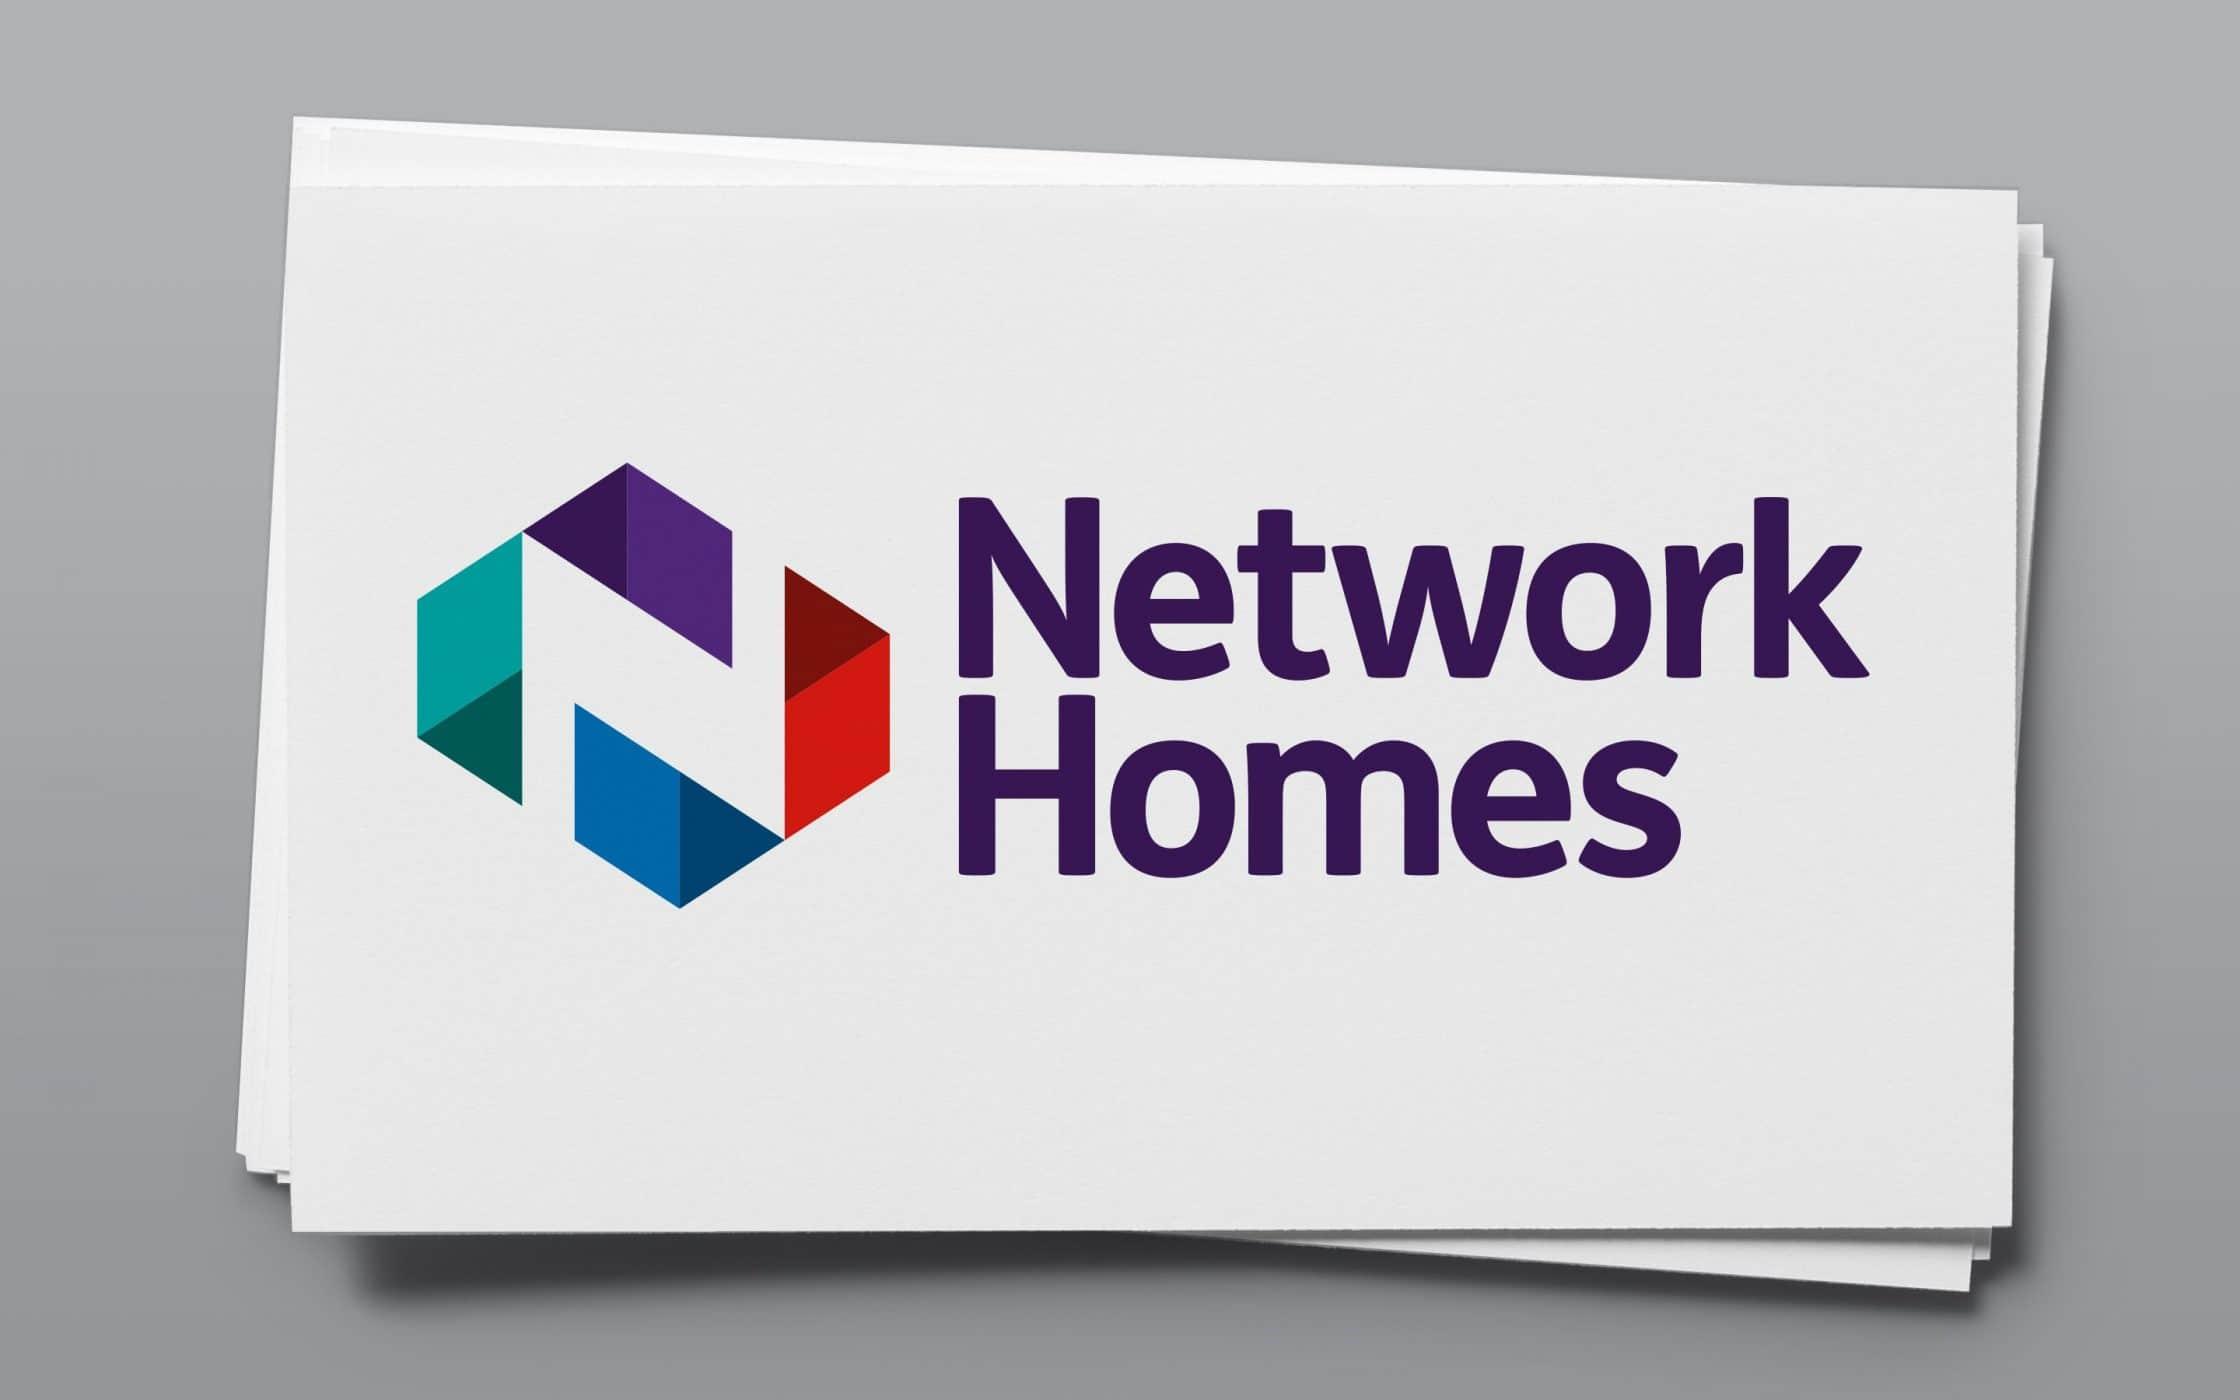 Network Homes branding on cards.